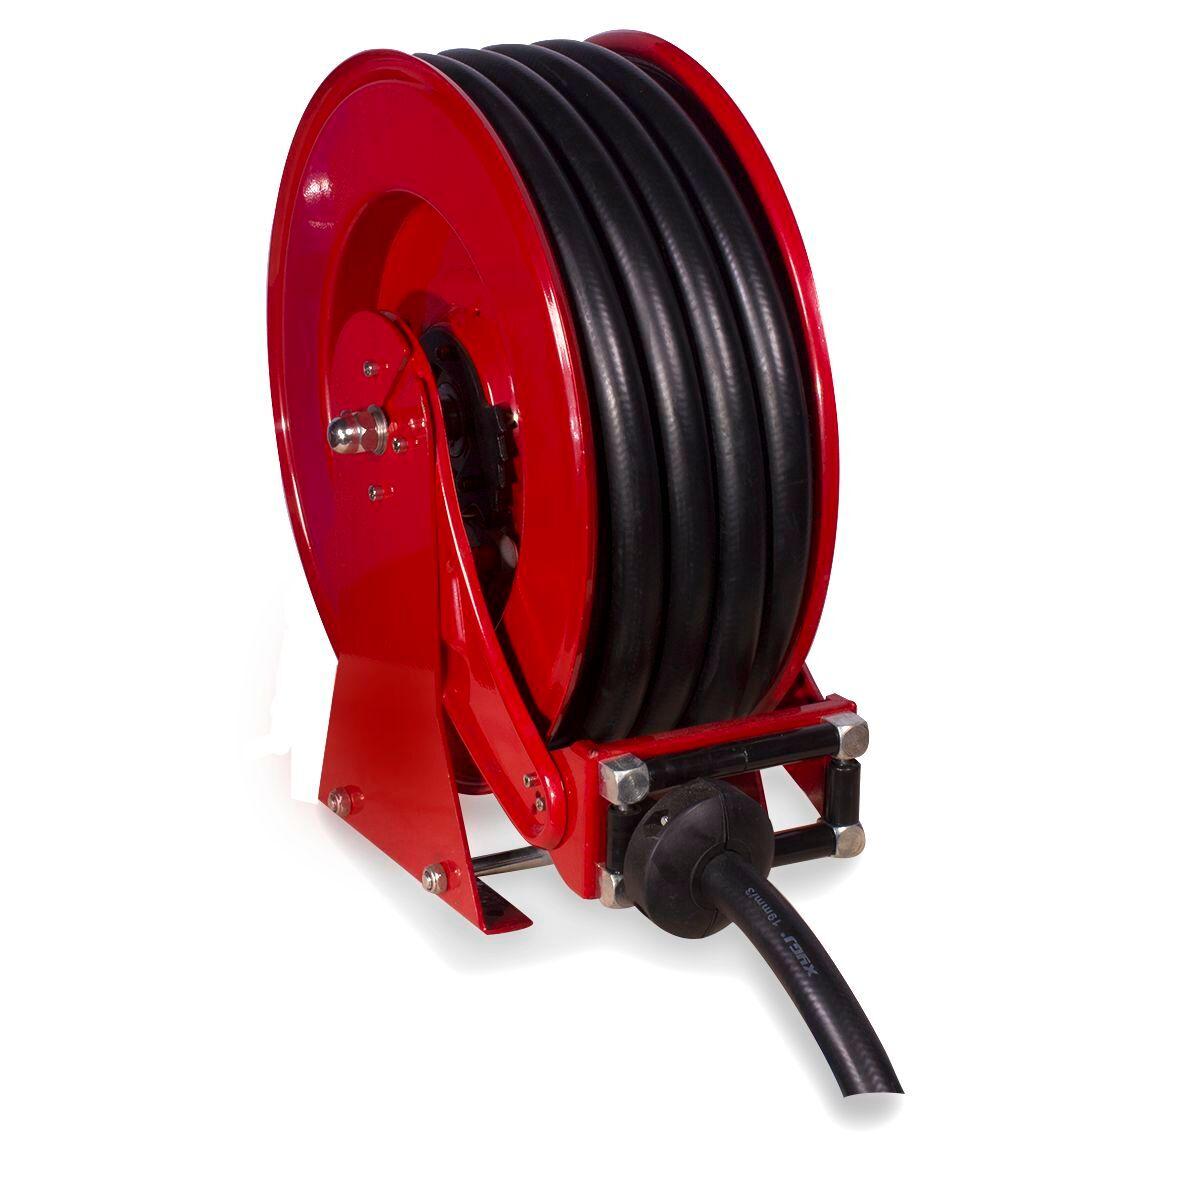 Mw-tools Enrouleur diesel 15 m - 3/4 MW-Tools SHD3415